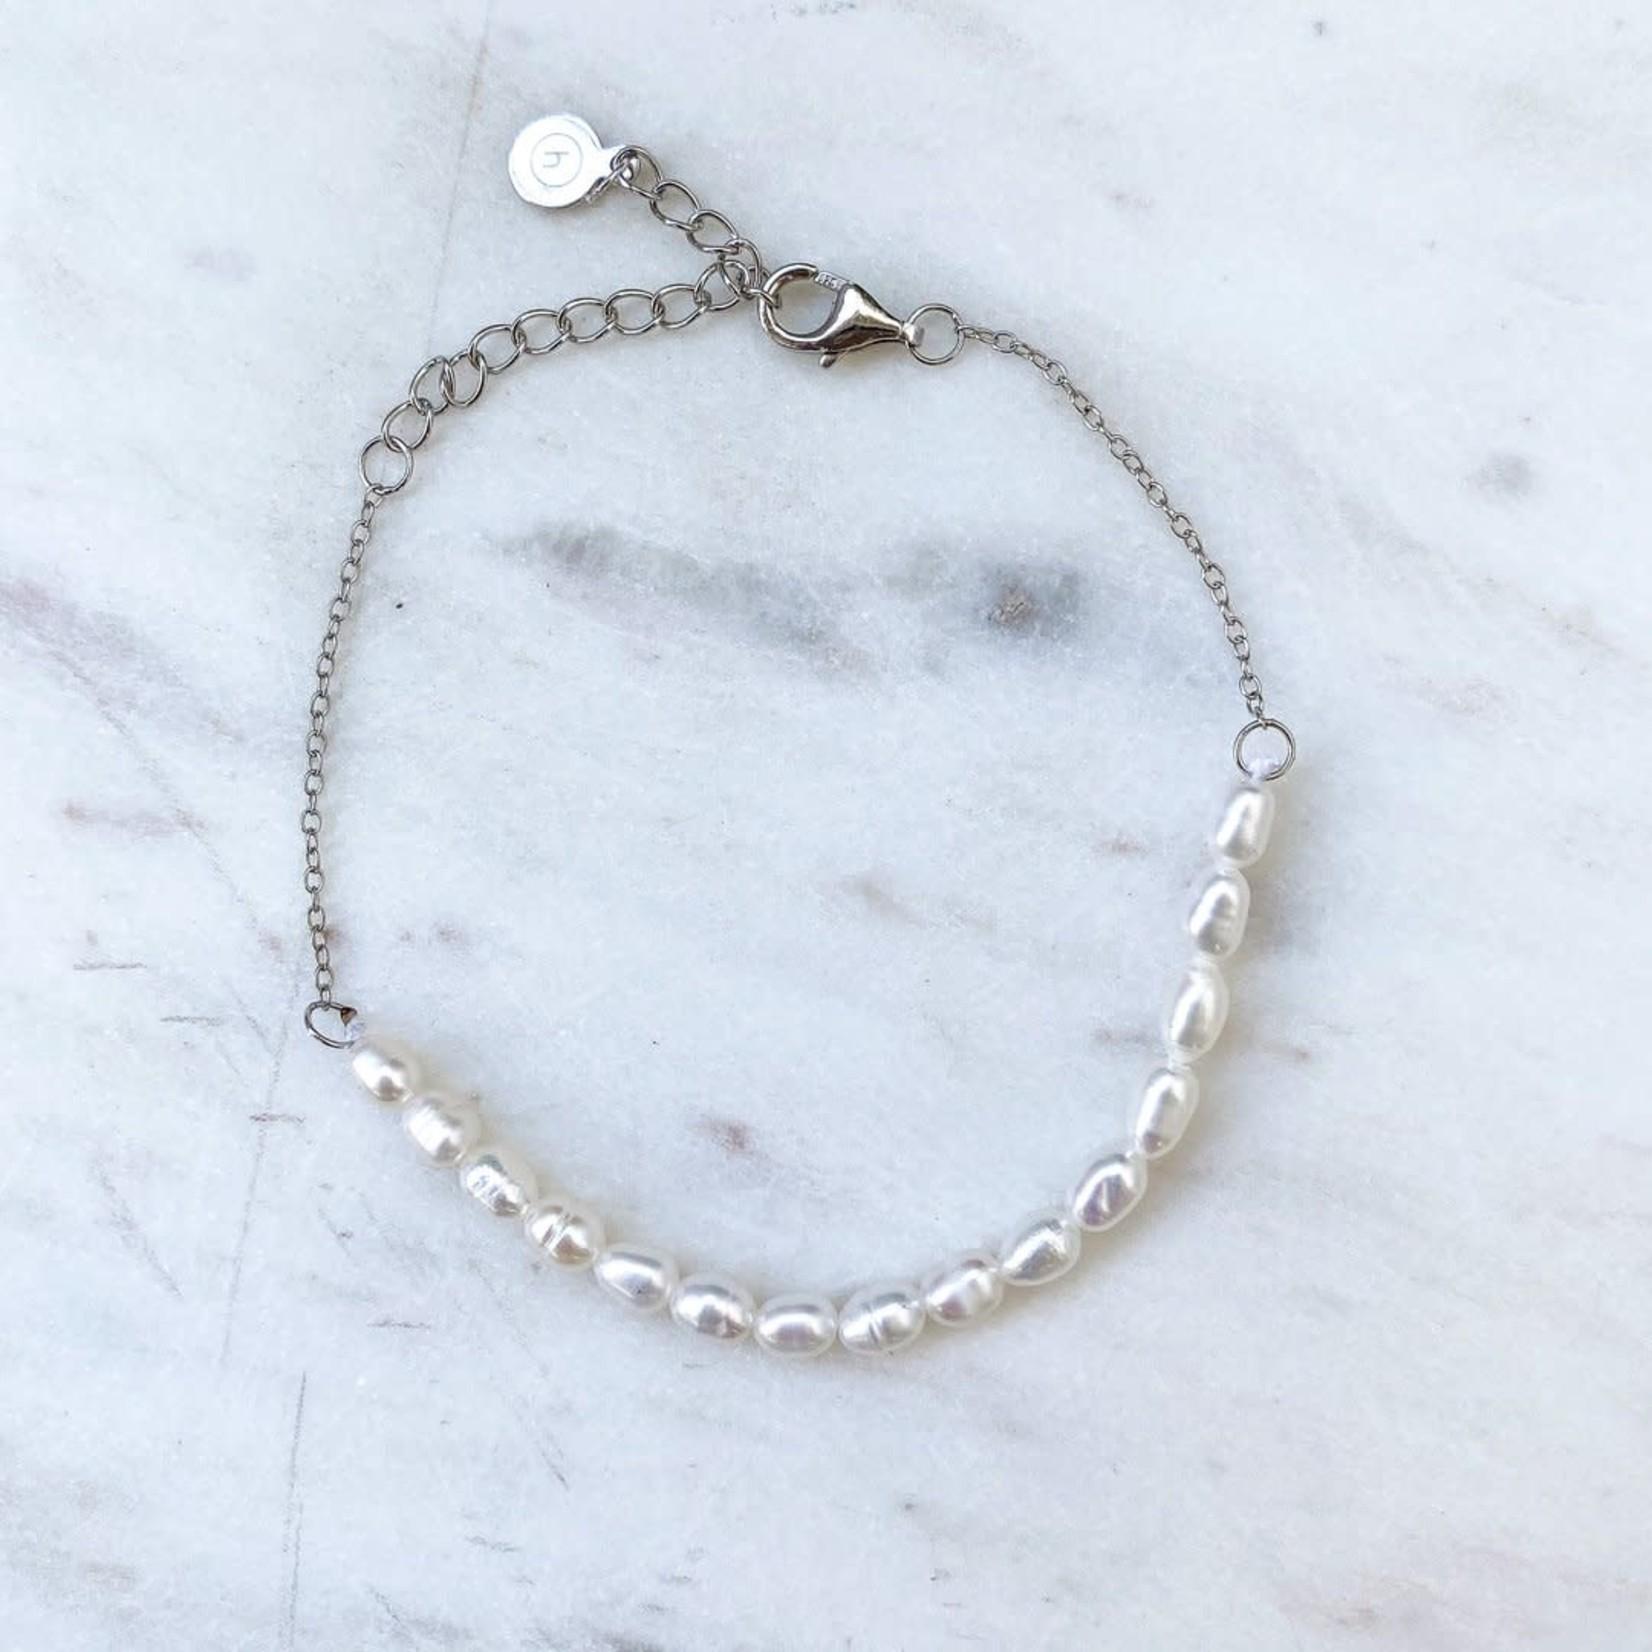 Horace Jewelry Horace bracelet DOUSSA